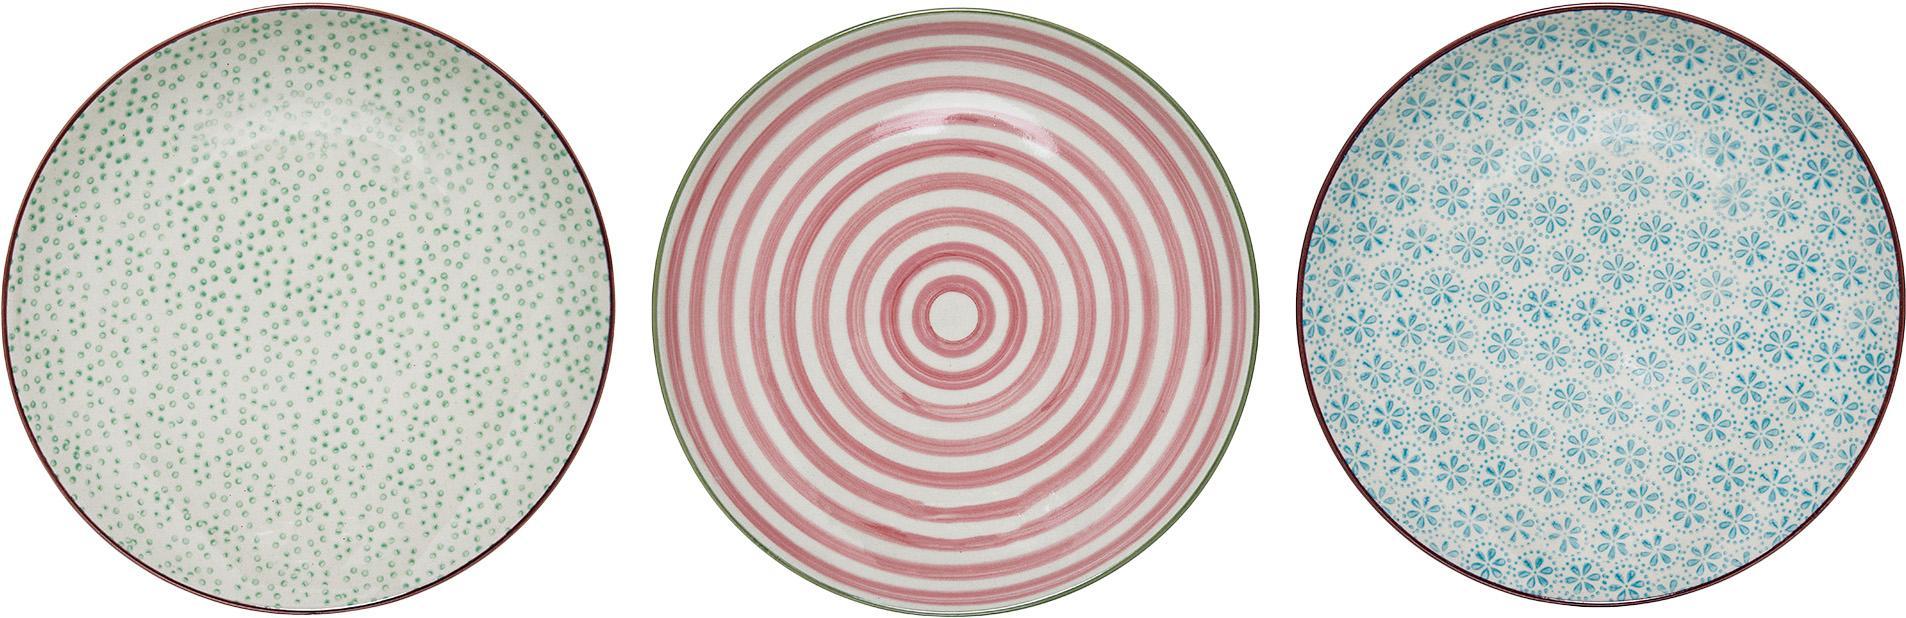 Ontbijtbordenset Patrizia, 3-delig, Keramiek, Wit, groen, rood, blauw, Ø 20 cm